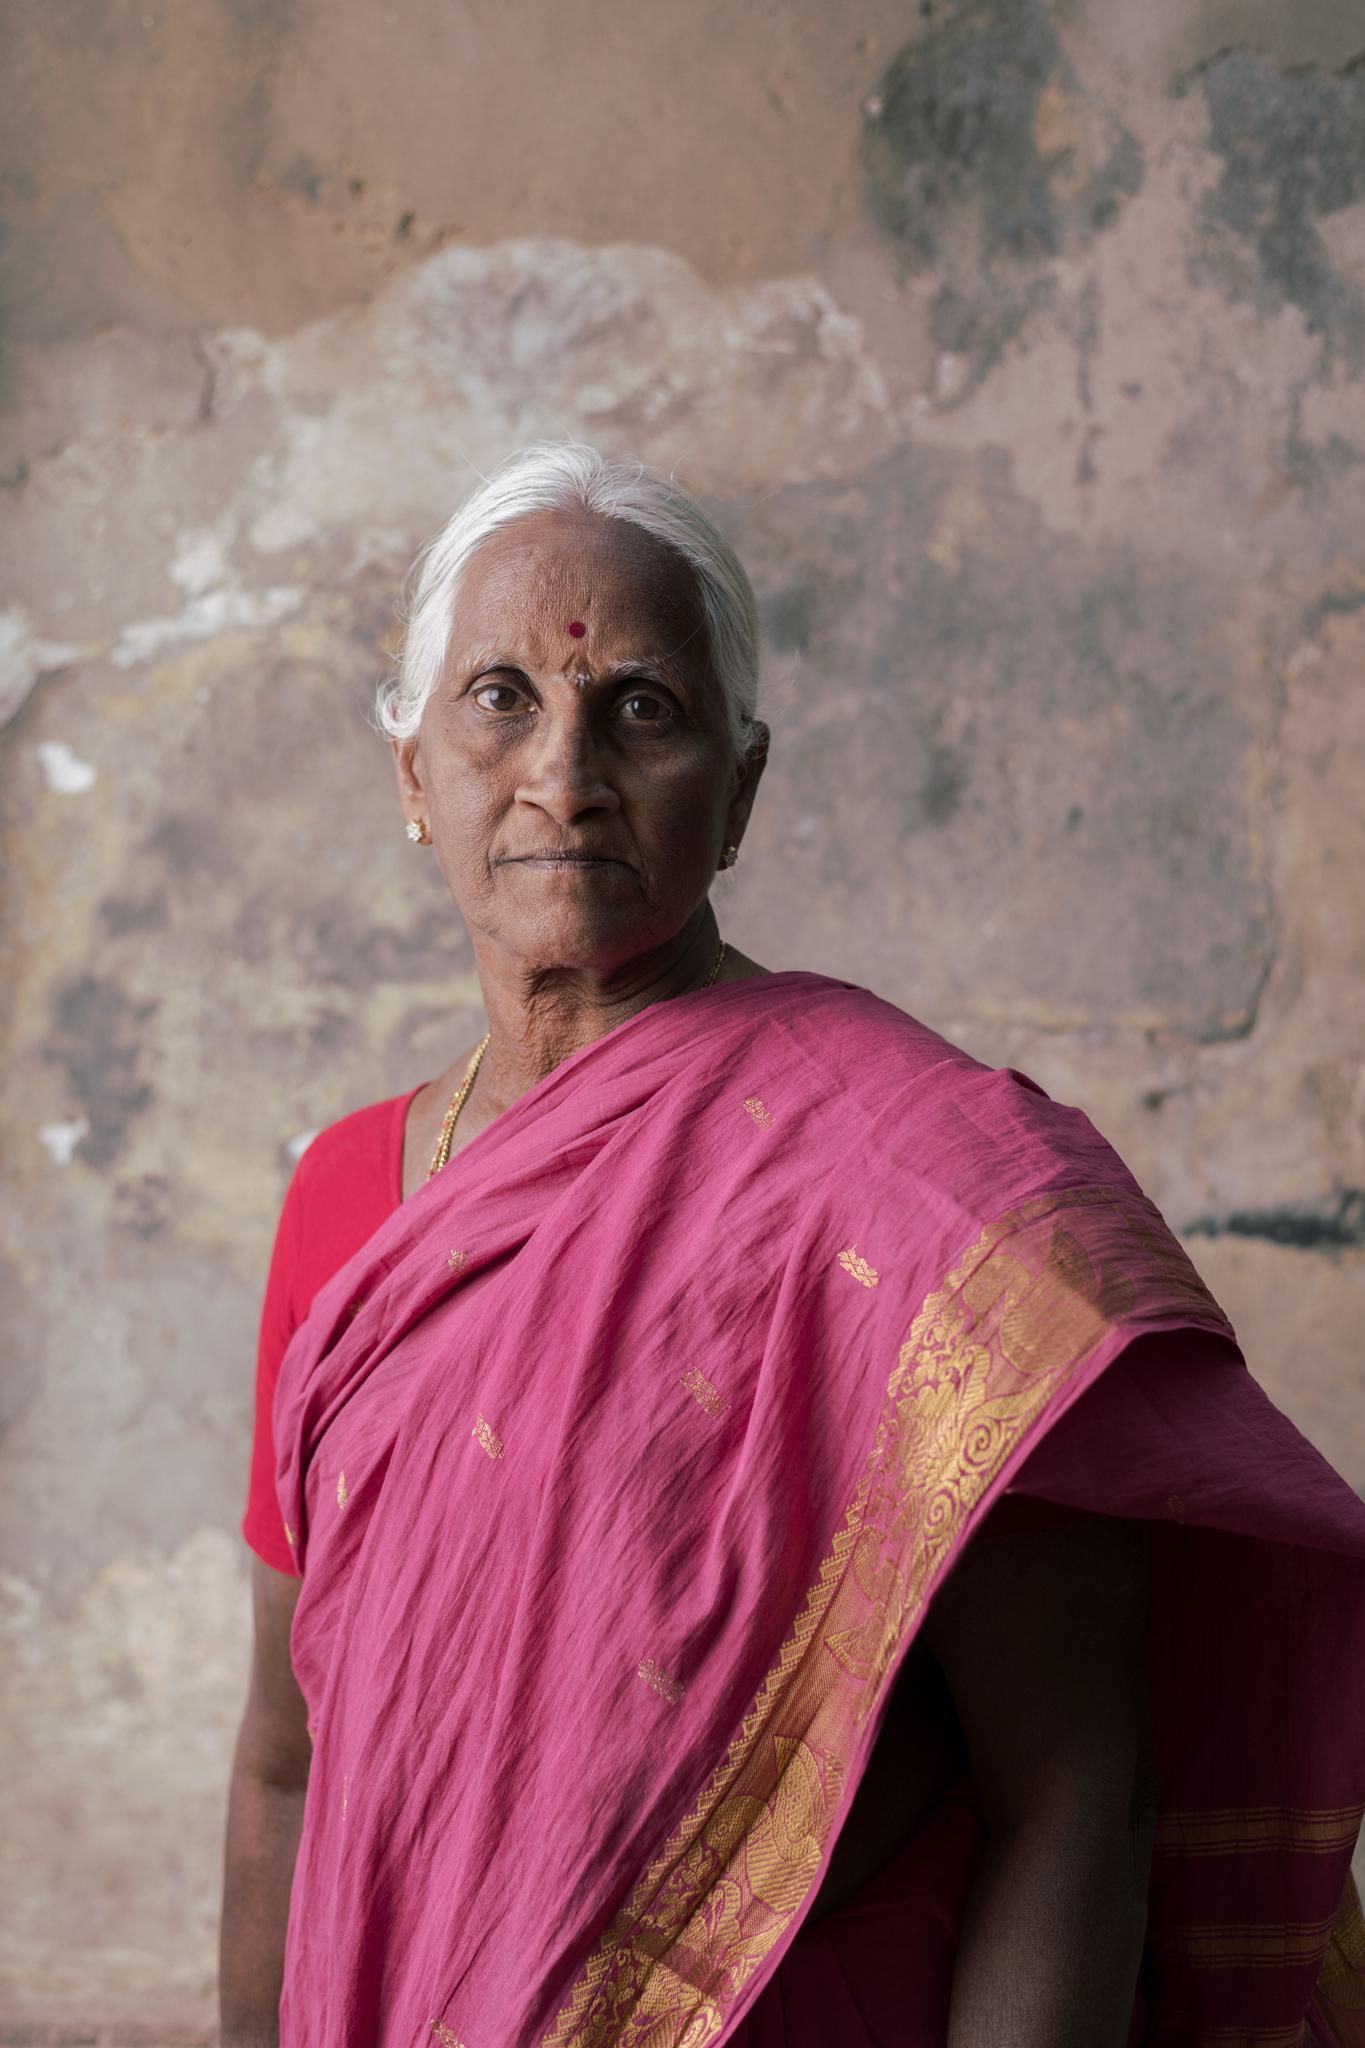 Varanasi_portrait_travel_photography_Manchester_Adventure_Photographer_Jan_Bella17.jpg